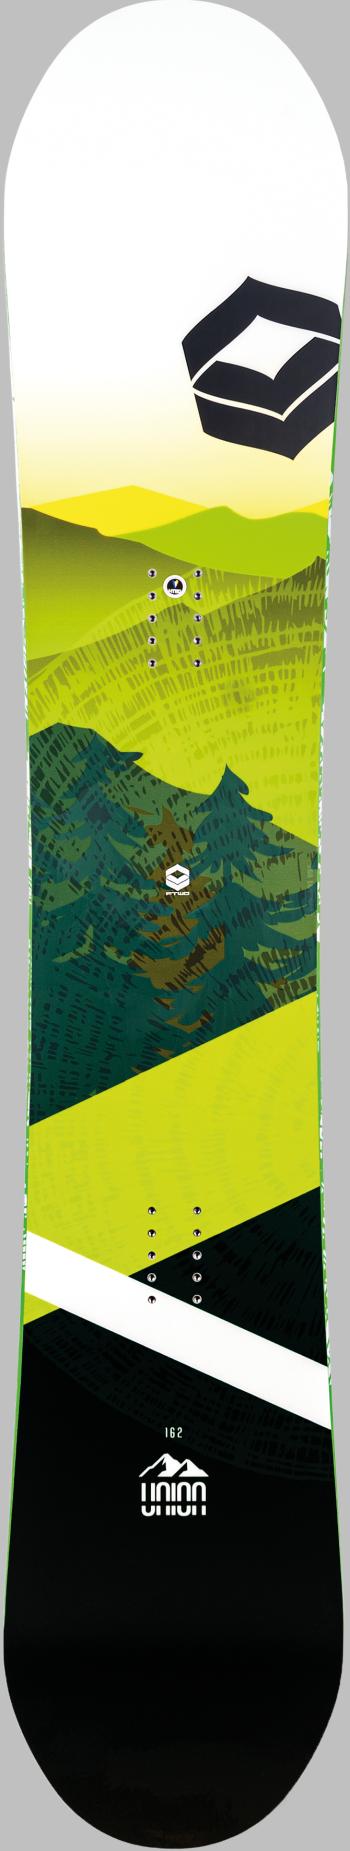 Union green - Top